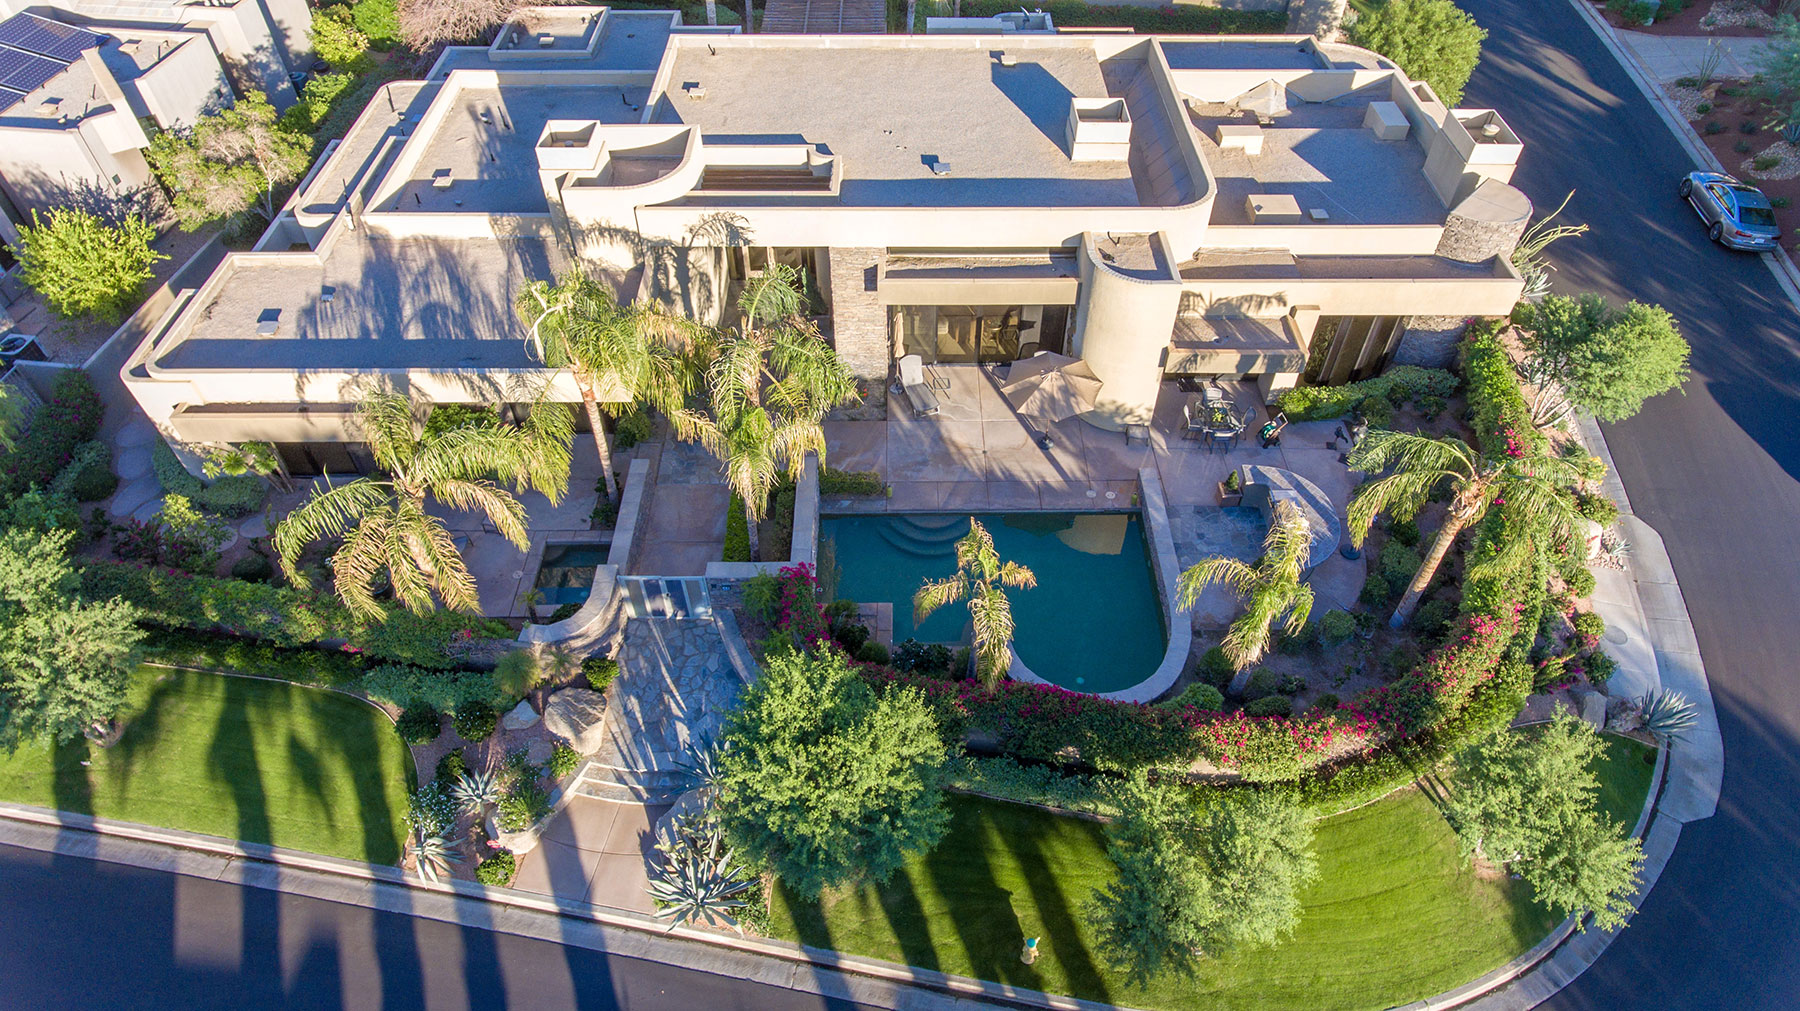 Single Family Home for Sale at 48 Ambassador Rancho Mirage, California, 92270 United States